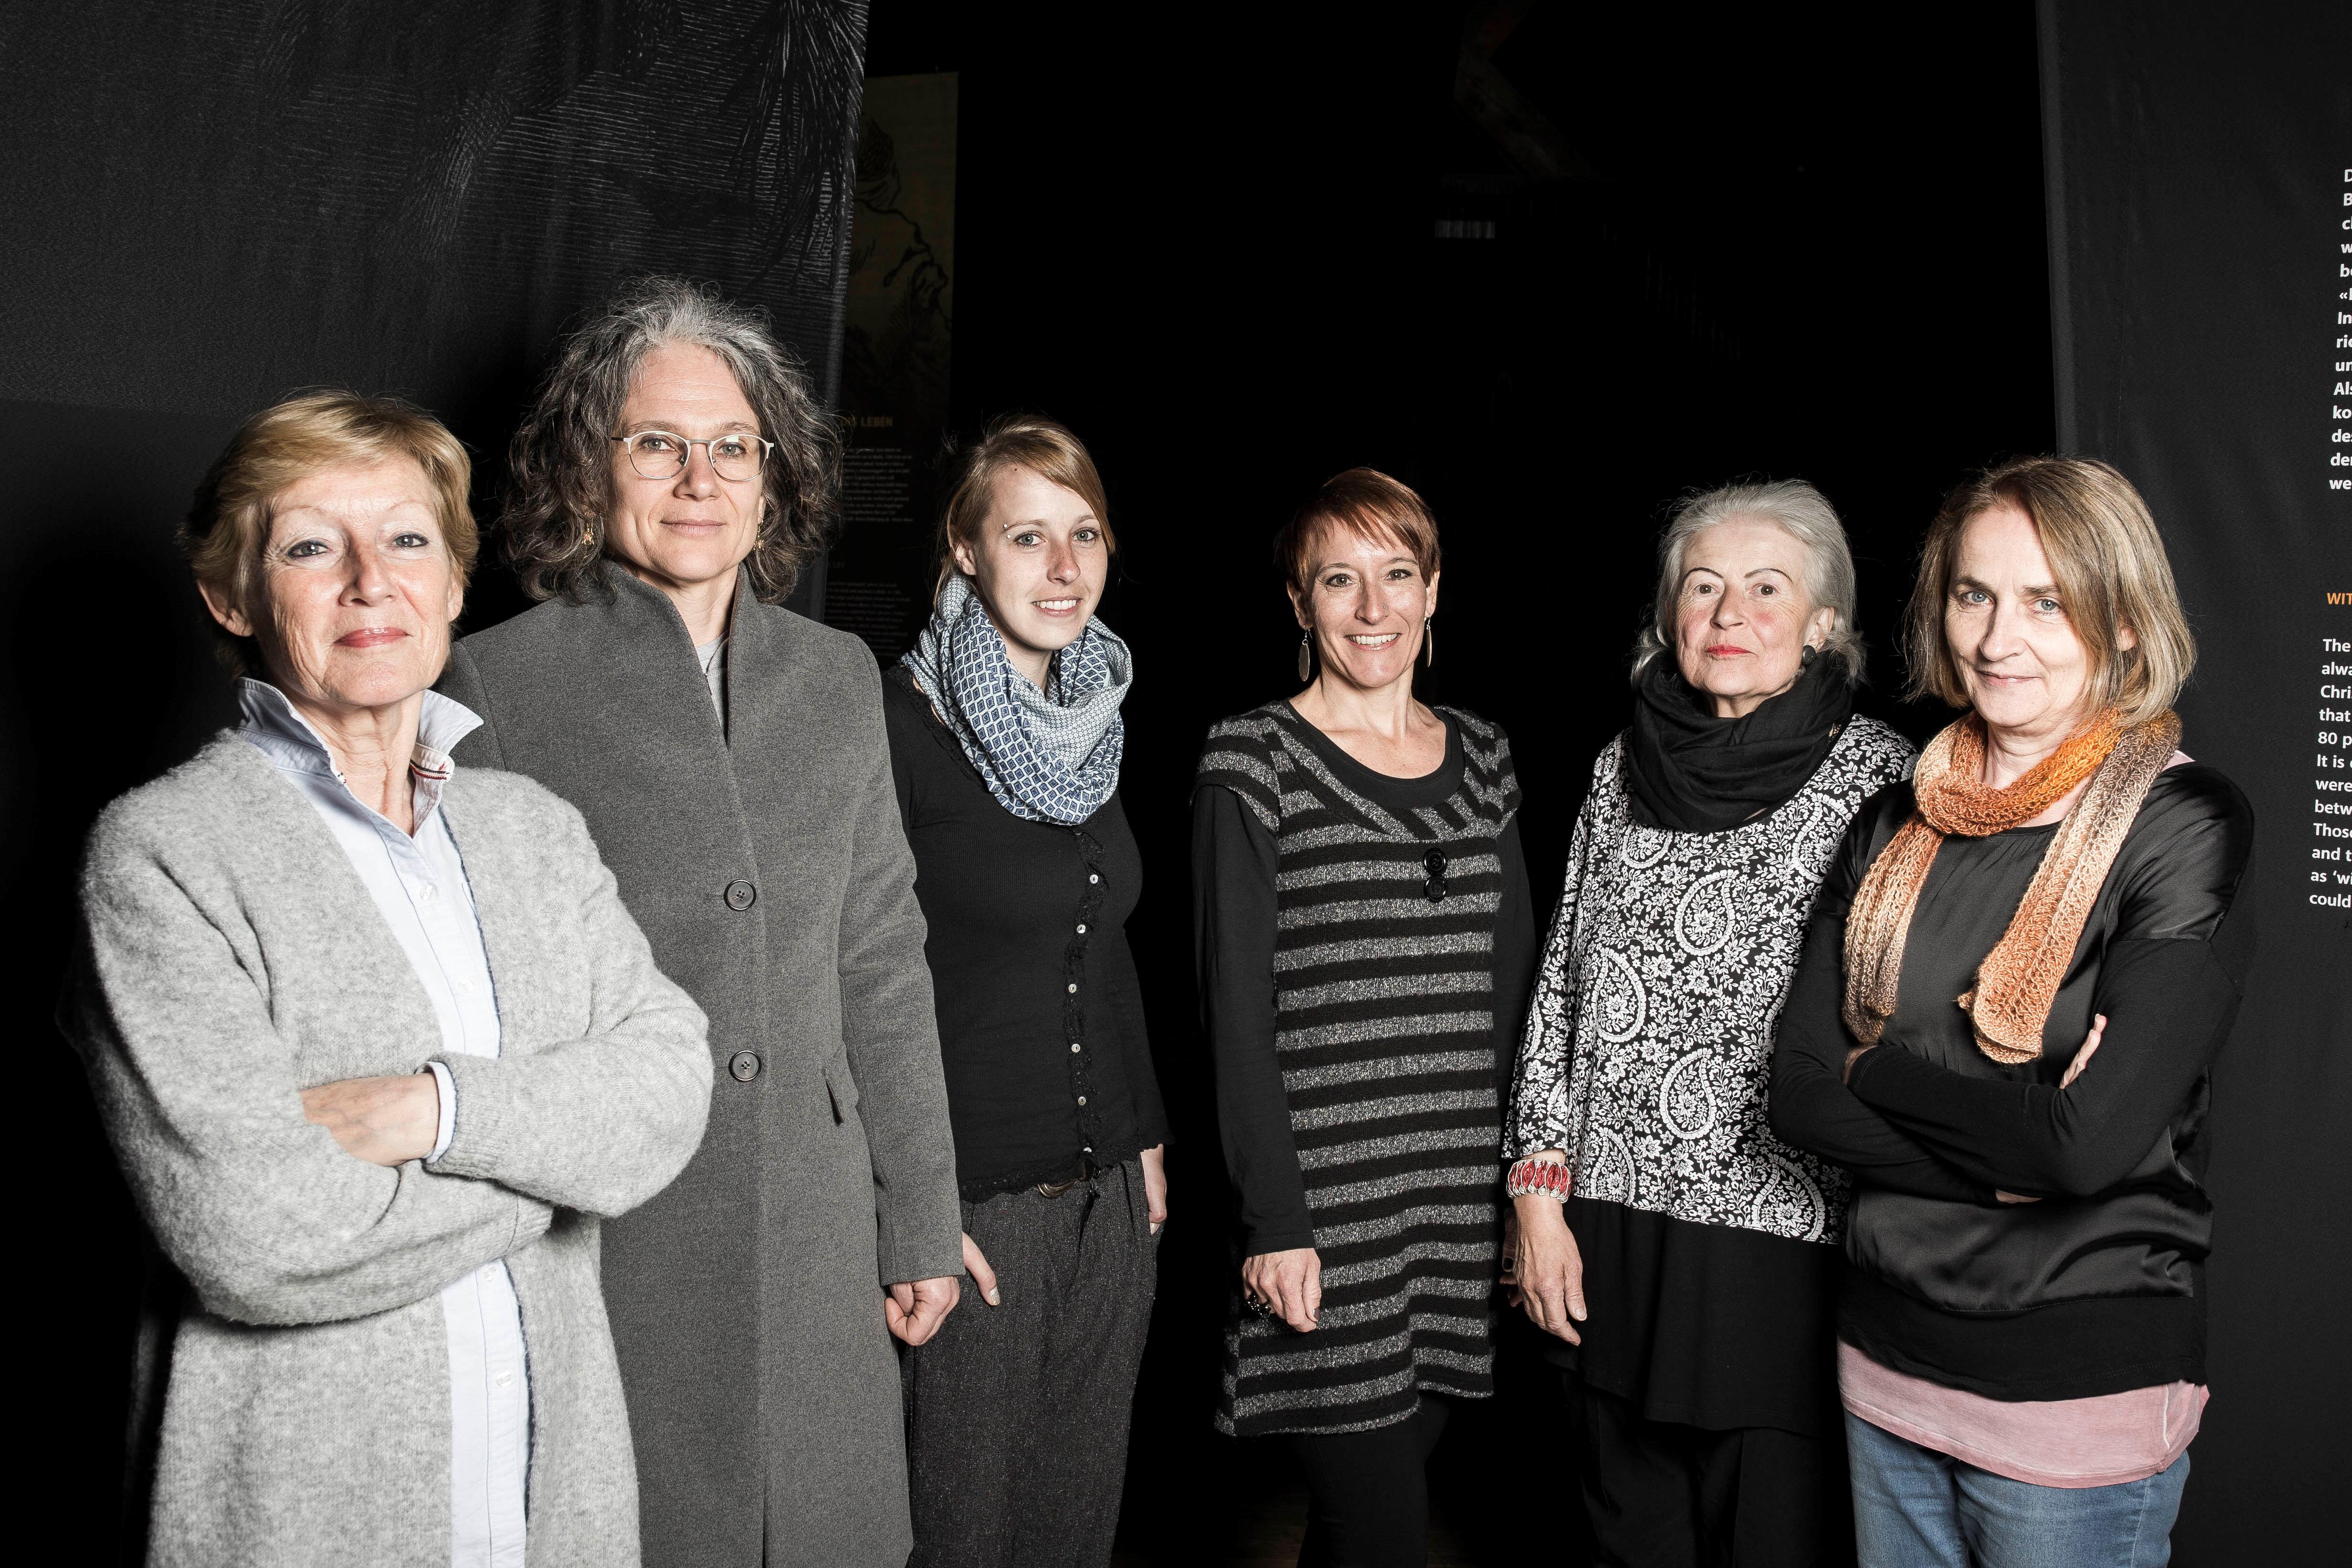 Maggie Wandfluh, Christine Späth, Linda Nafzger, Nadja Kundert, Rita Grendelmeier, Astrid Rhyner